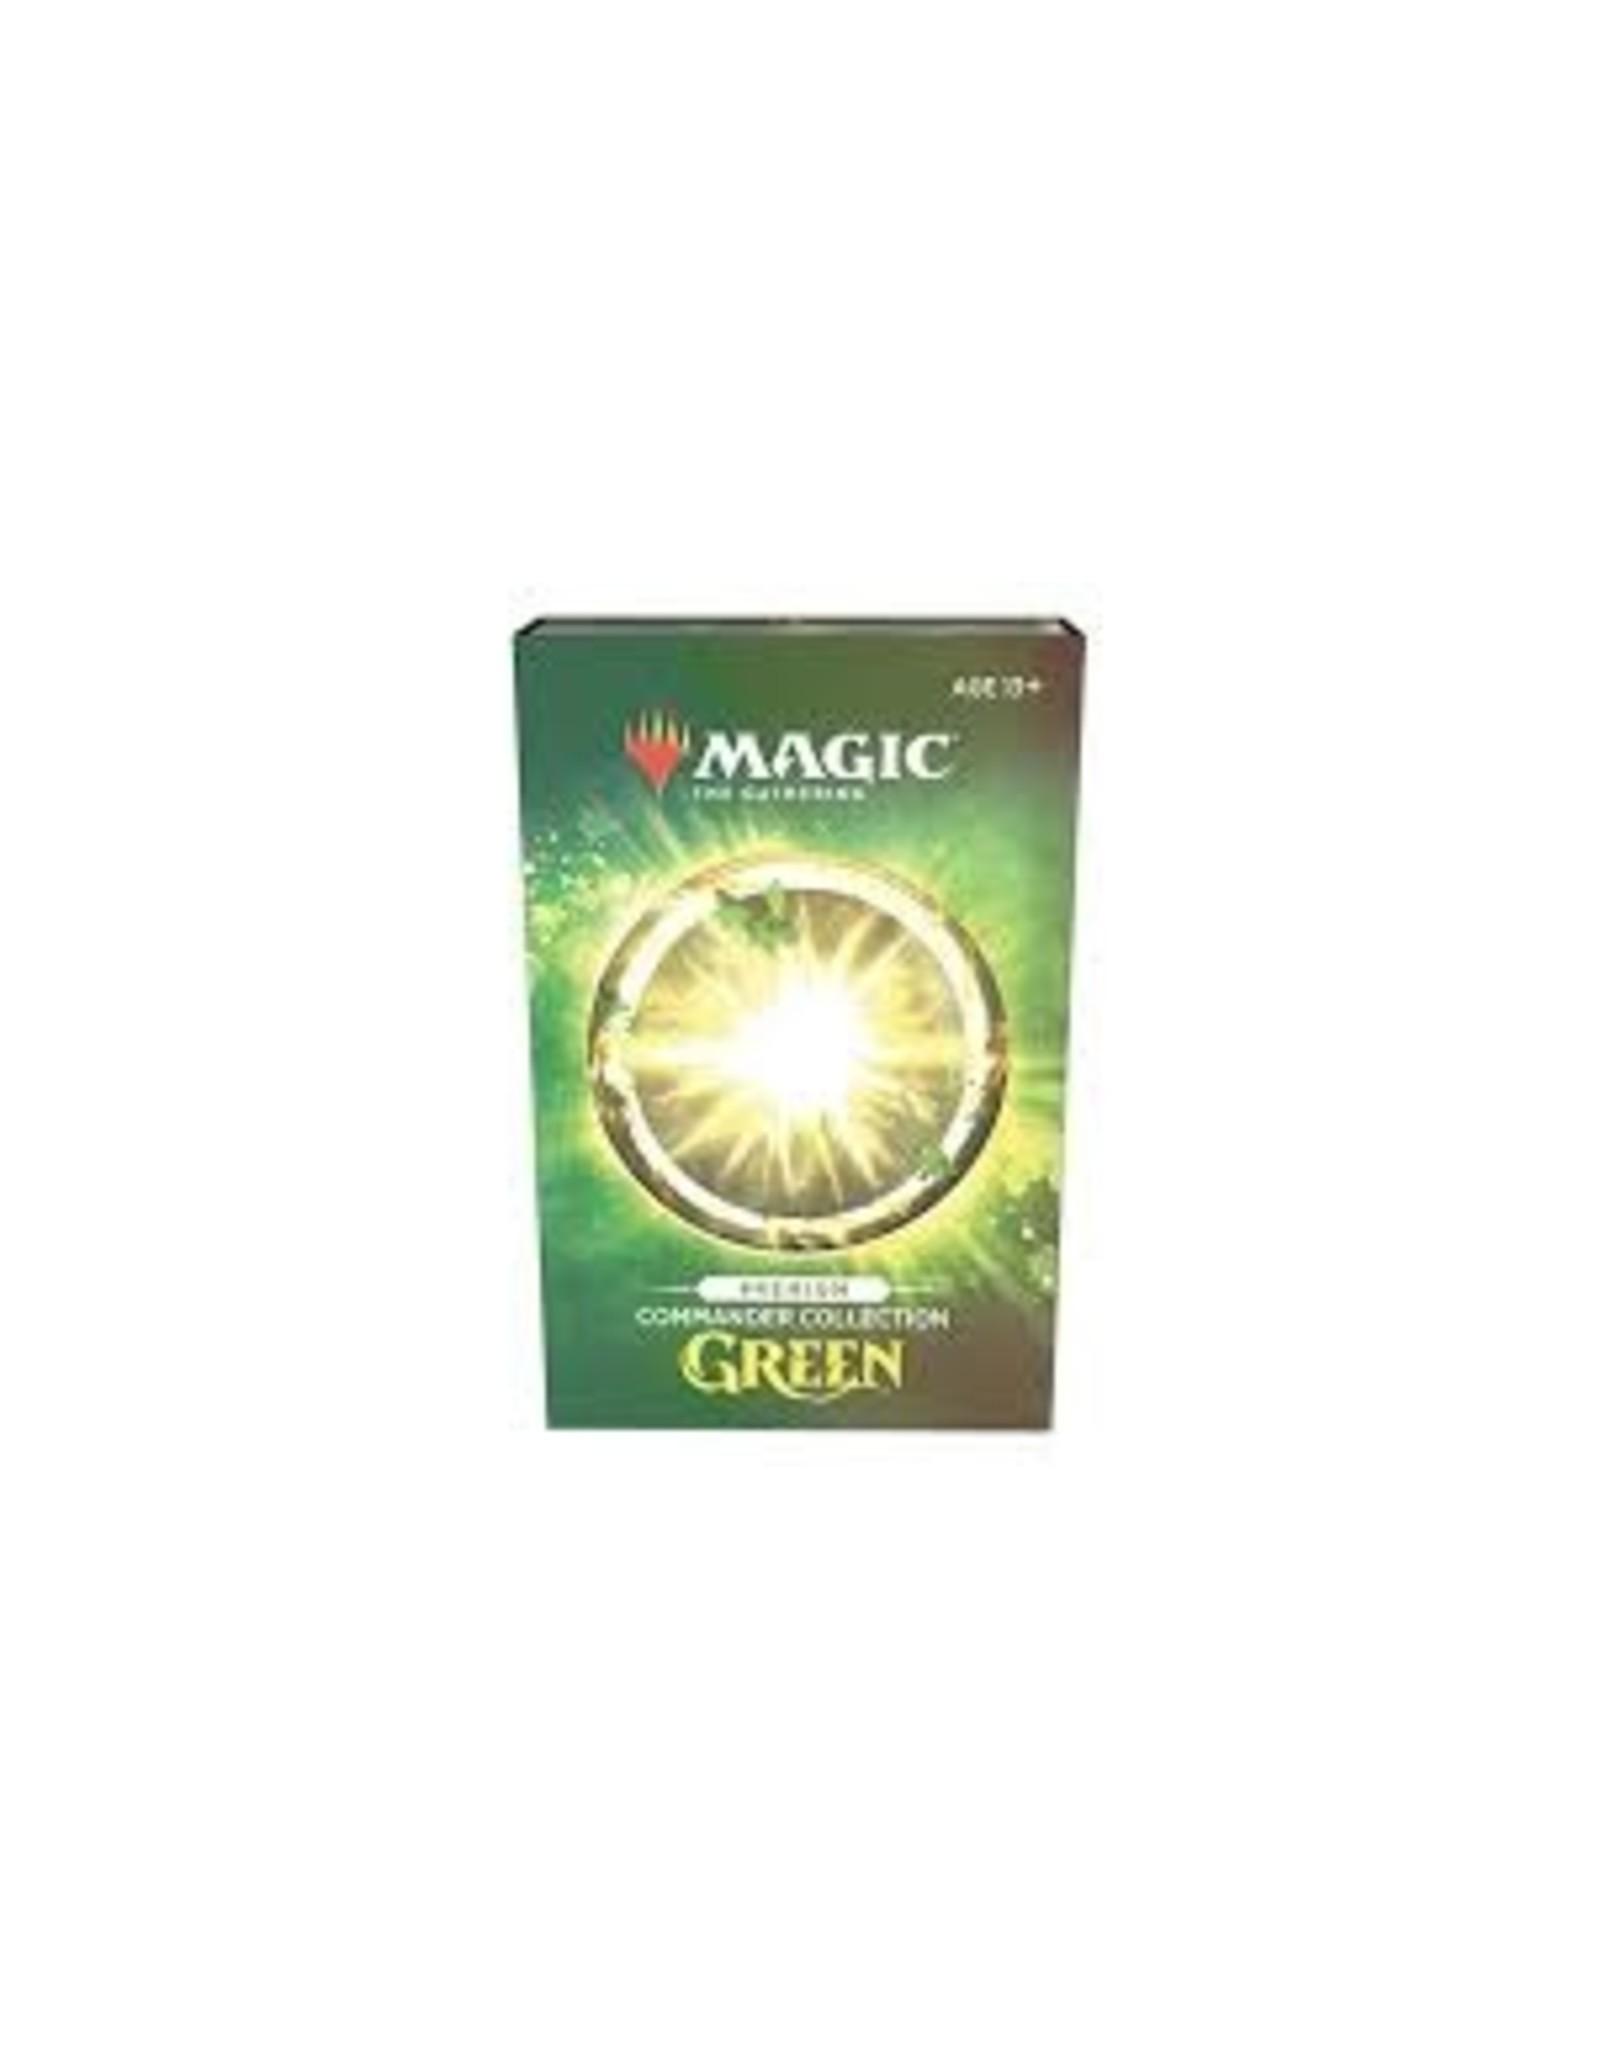 Magic MtG: Commander Collection: Green - Premium Edition